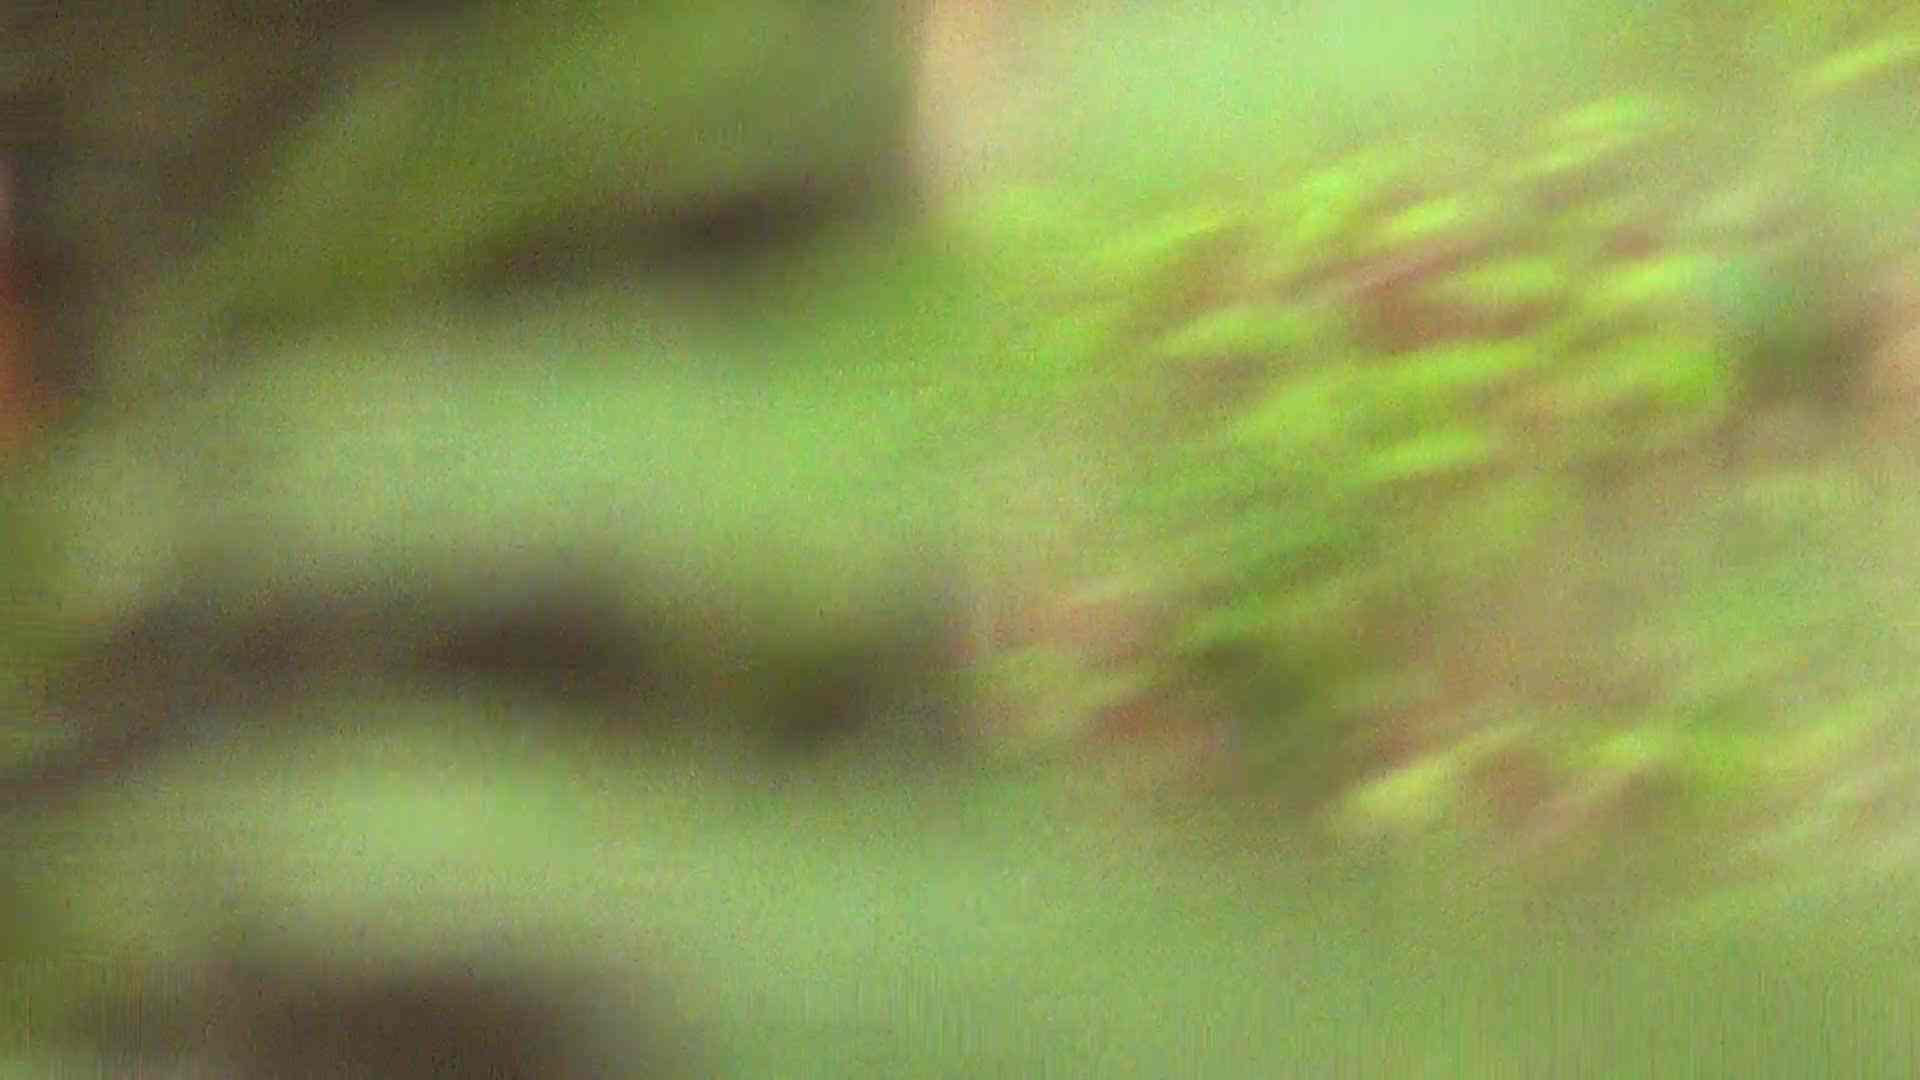 Aquaな露天風呂Vol.247 OLのエロ生活 おめこ無修正画像 83連発 62